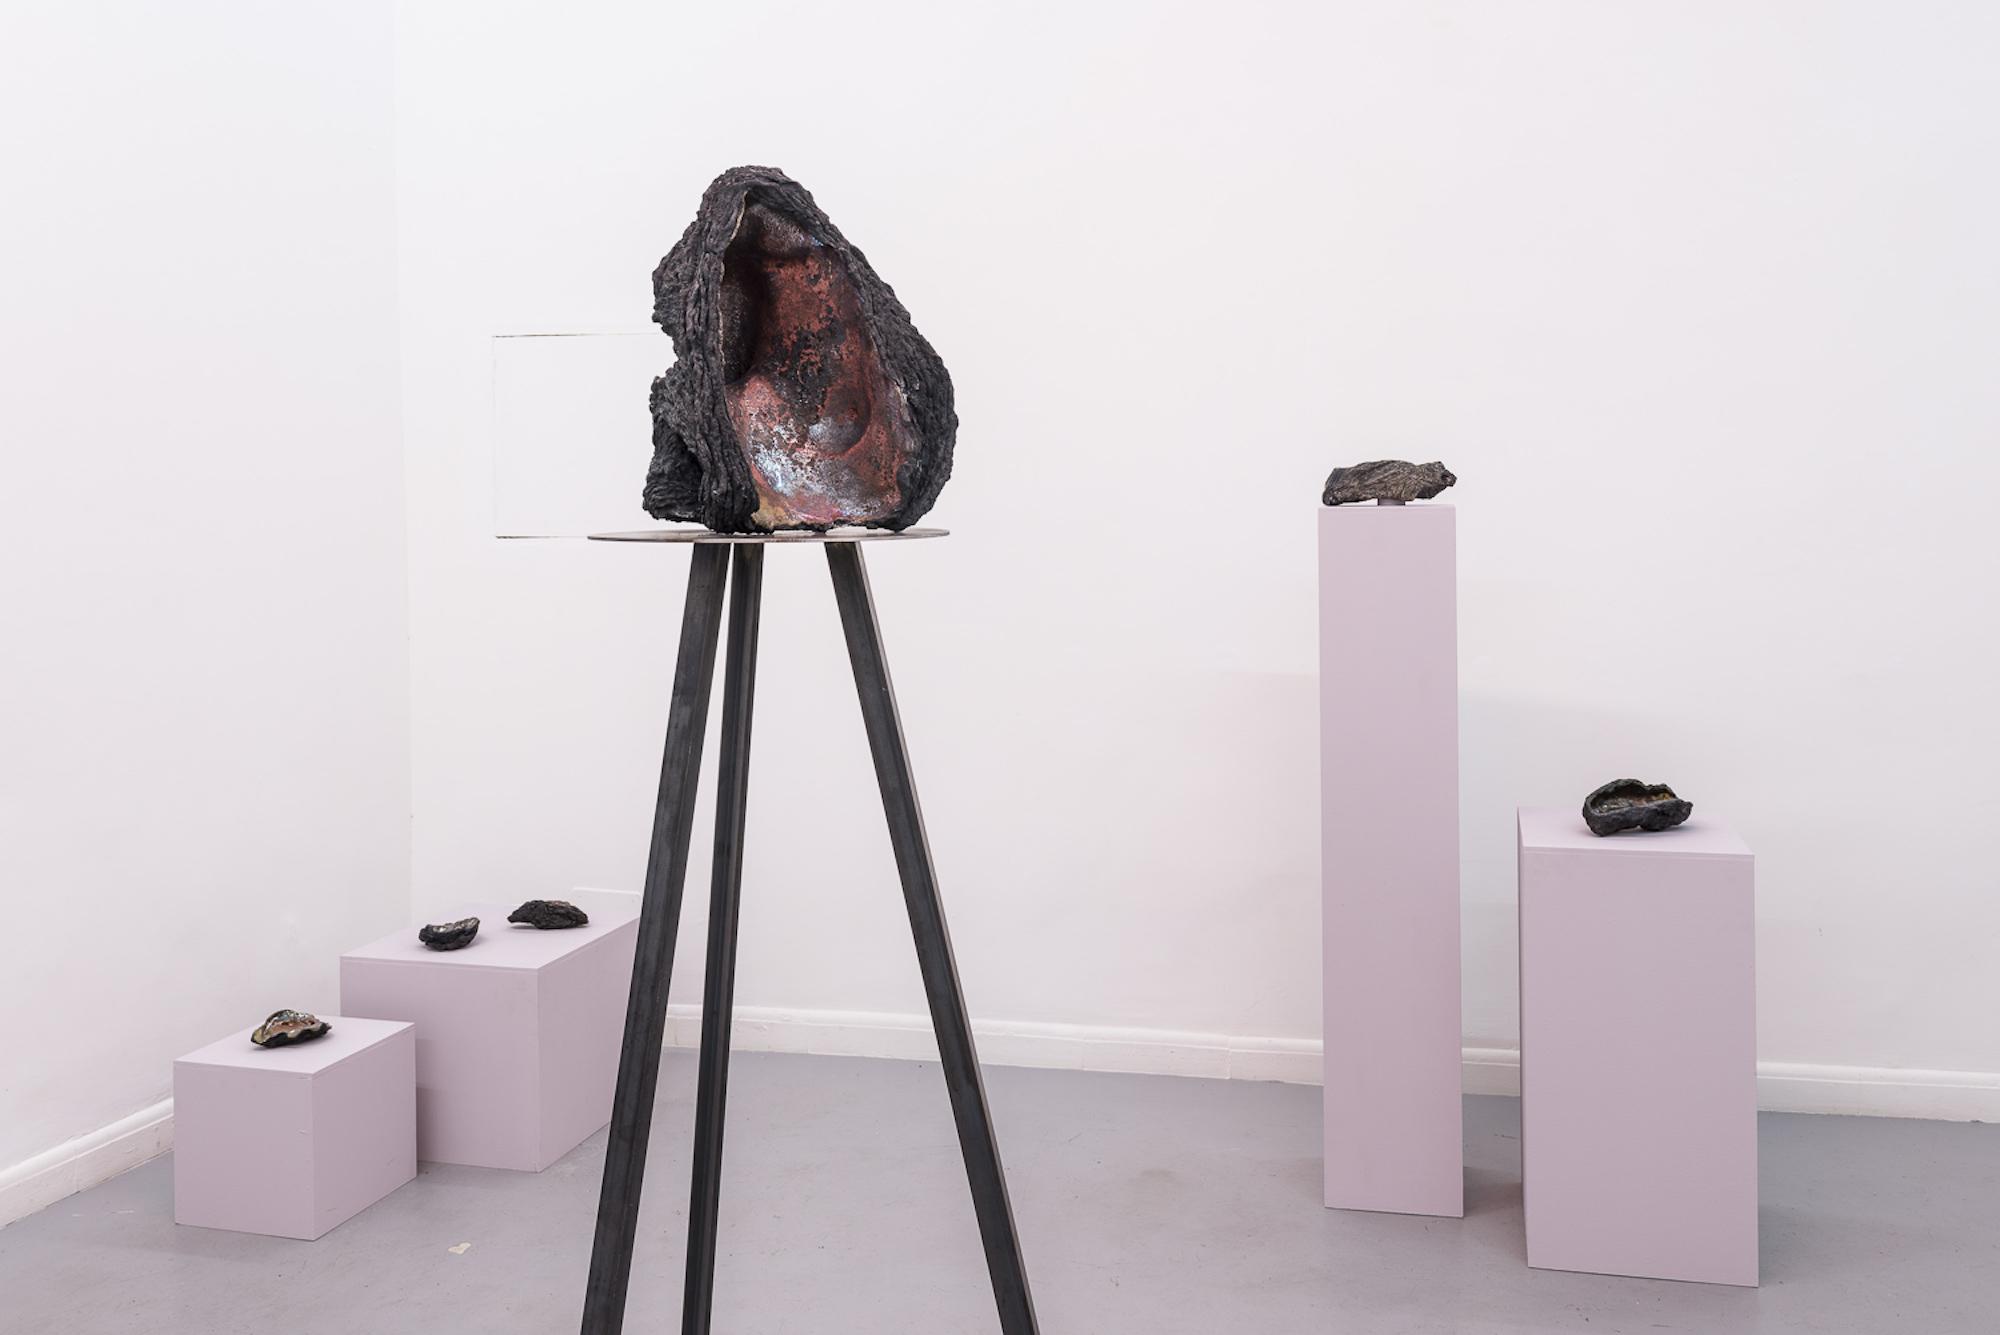 Cleo Fariselli, Dy Yiayi, Exhibition view. Operativa, Rome. Photo Sebastiano Luciano. 3b